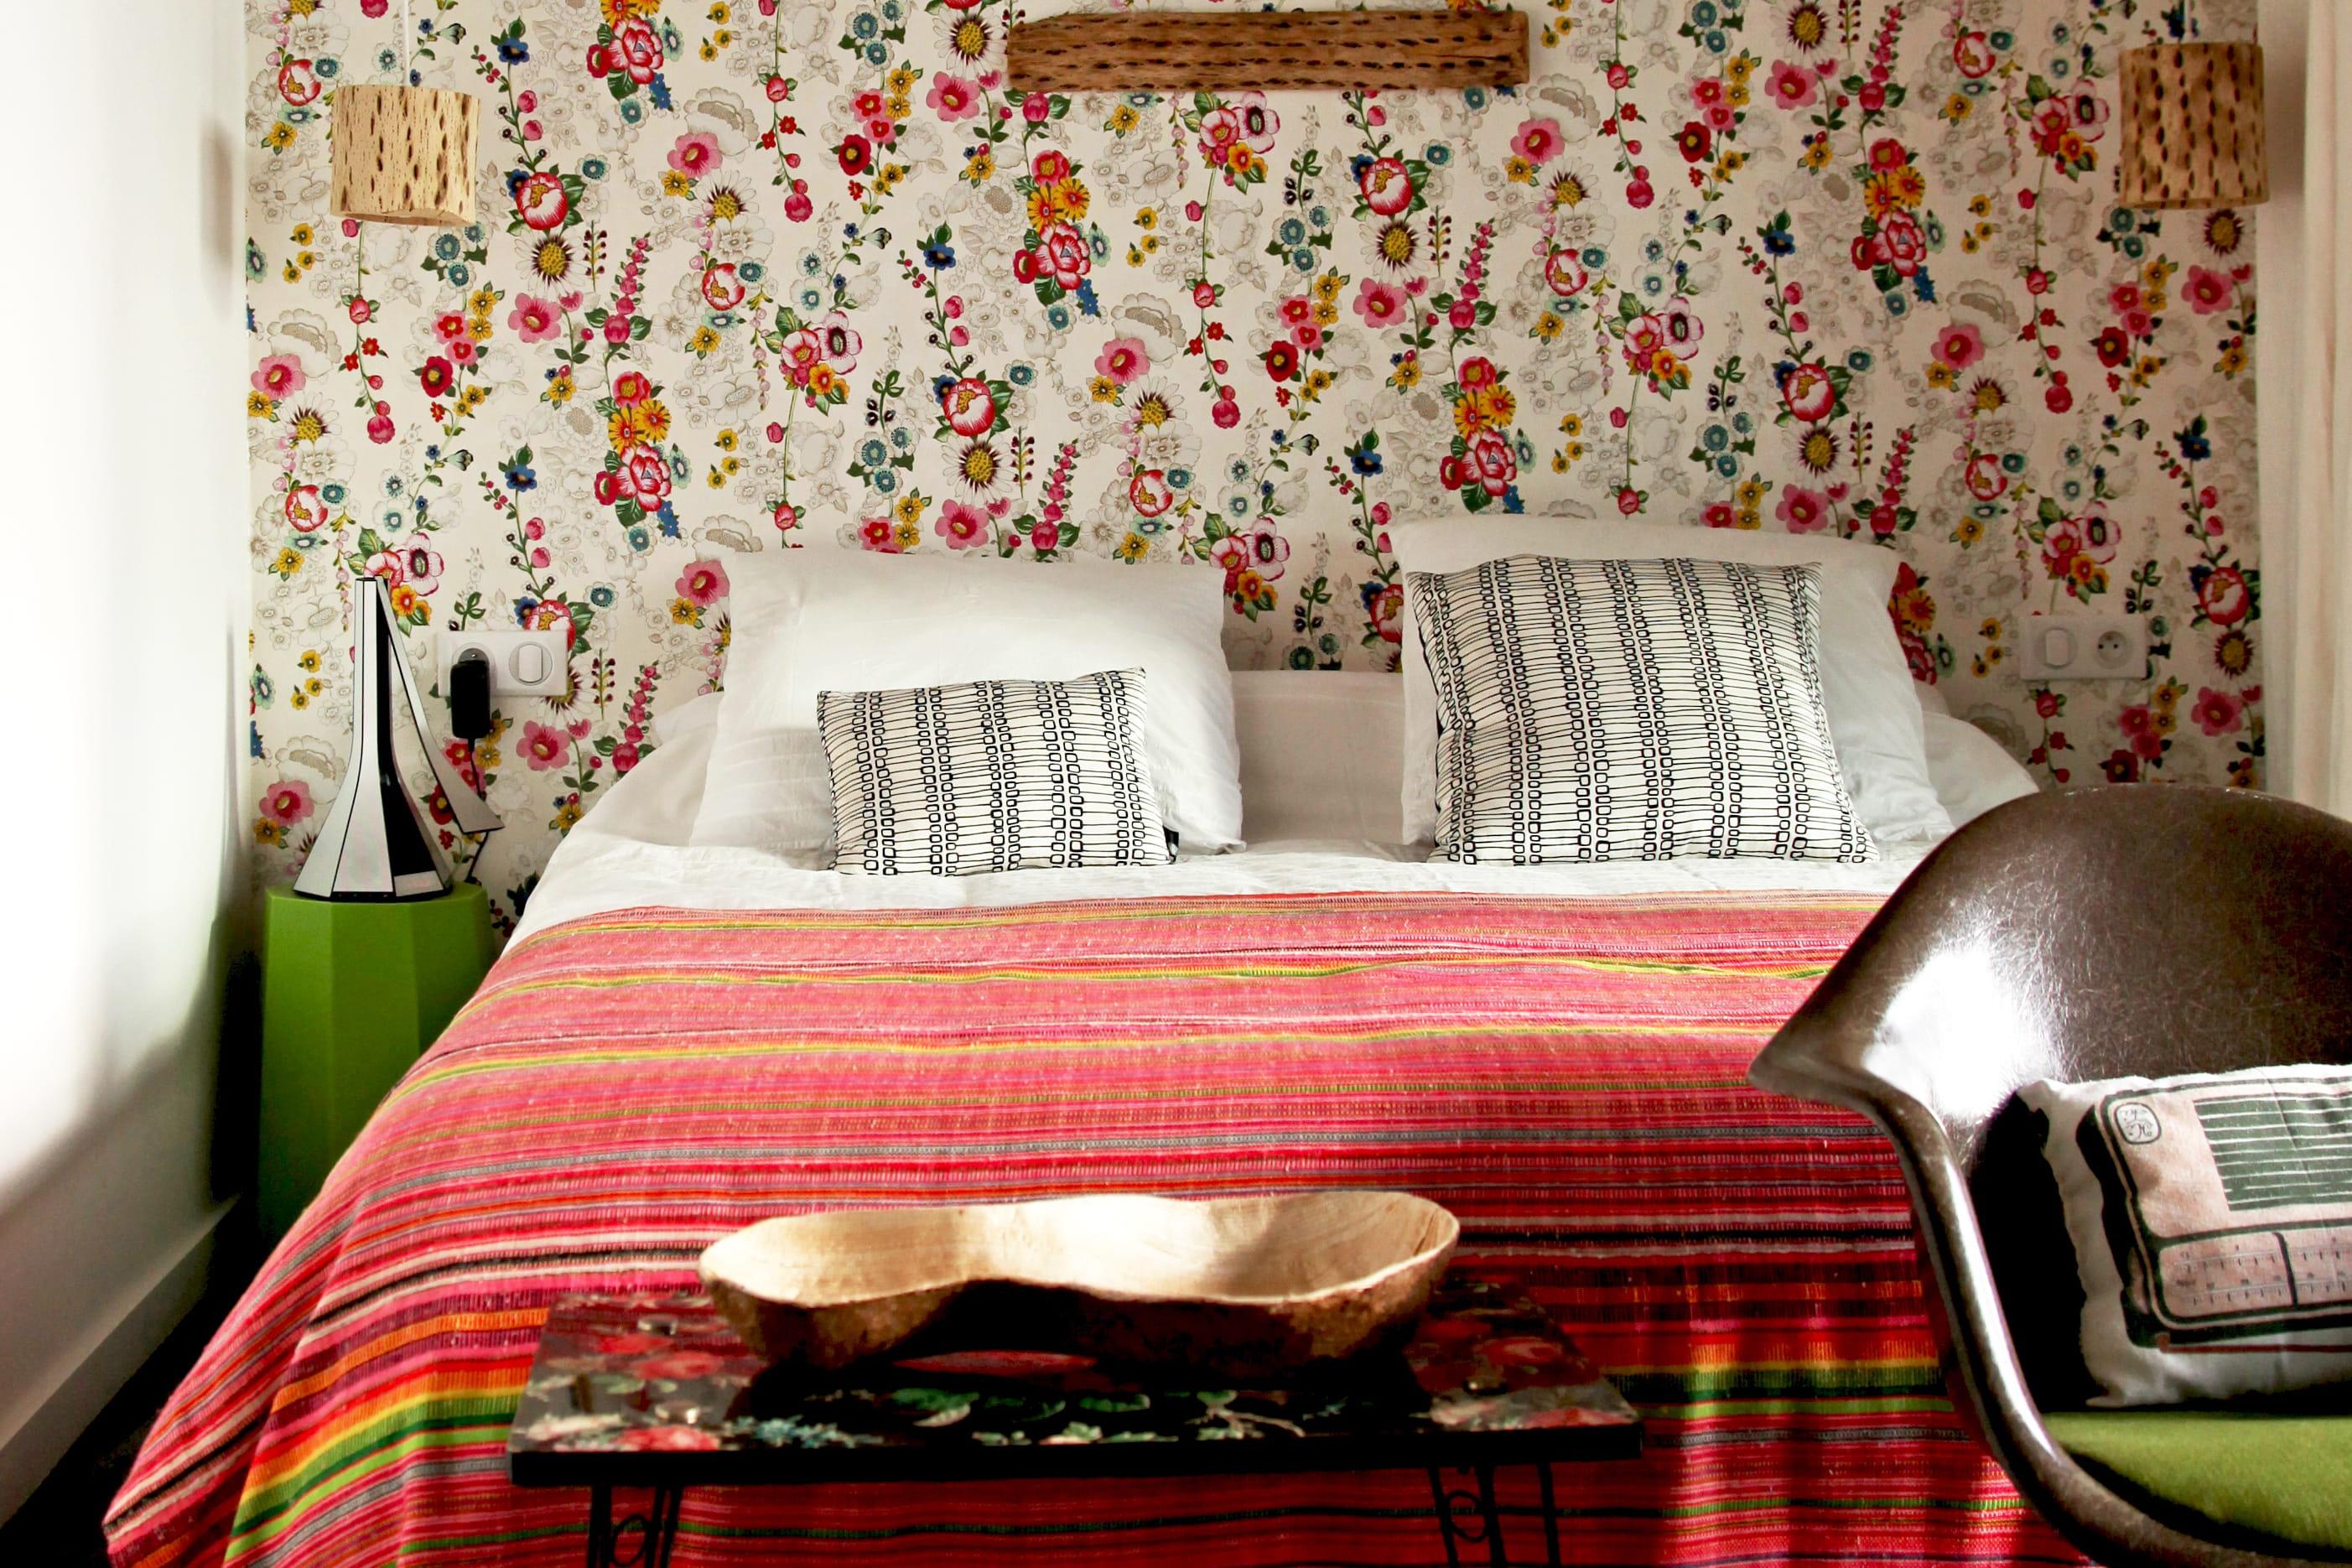 le style boh me chic en d co journal des femmes. Black Bedroom Furniture Sets. Home Design Ideas